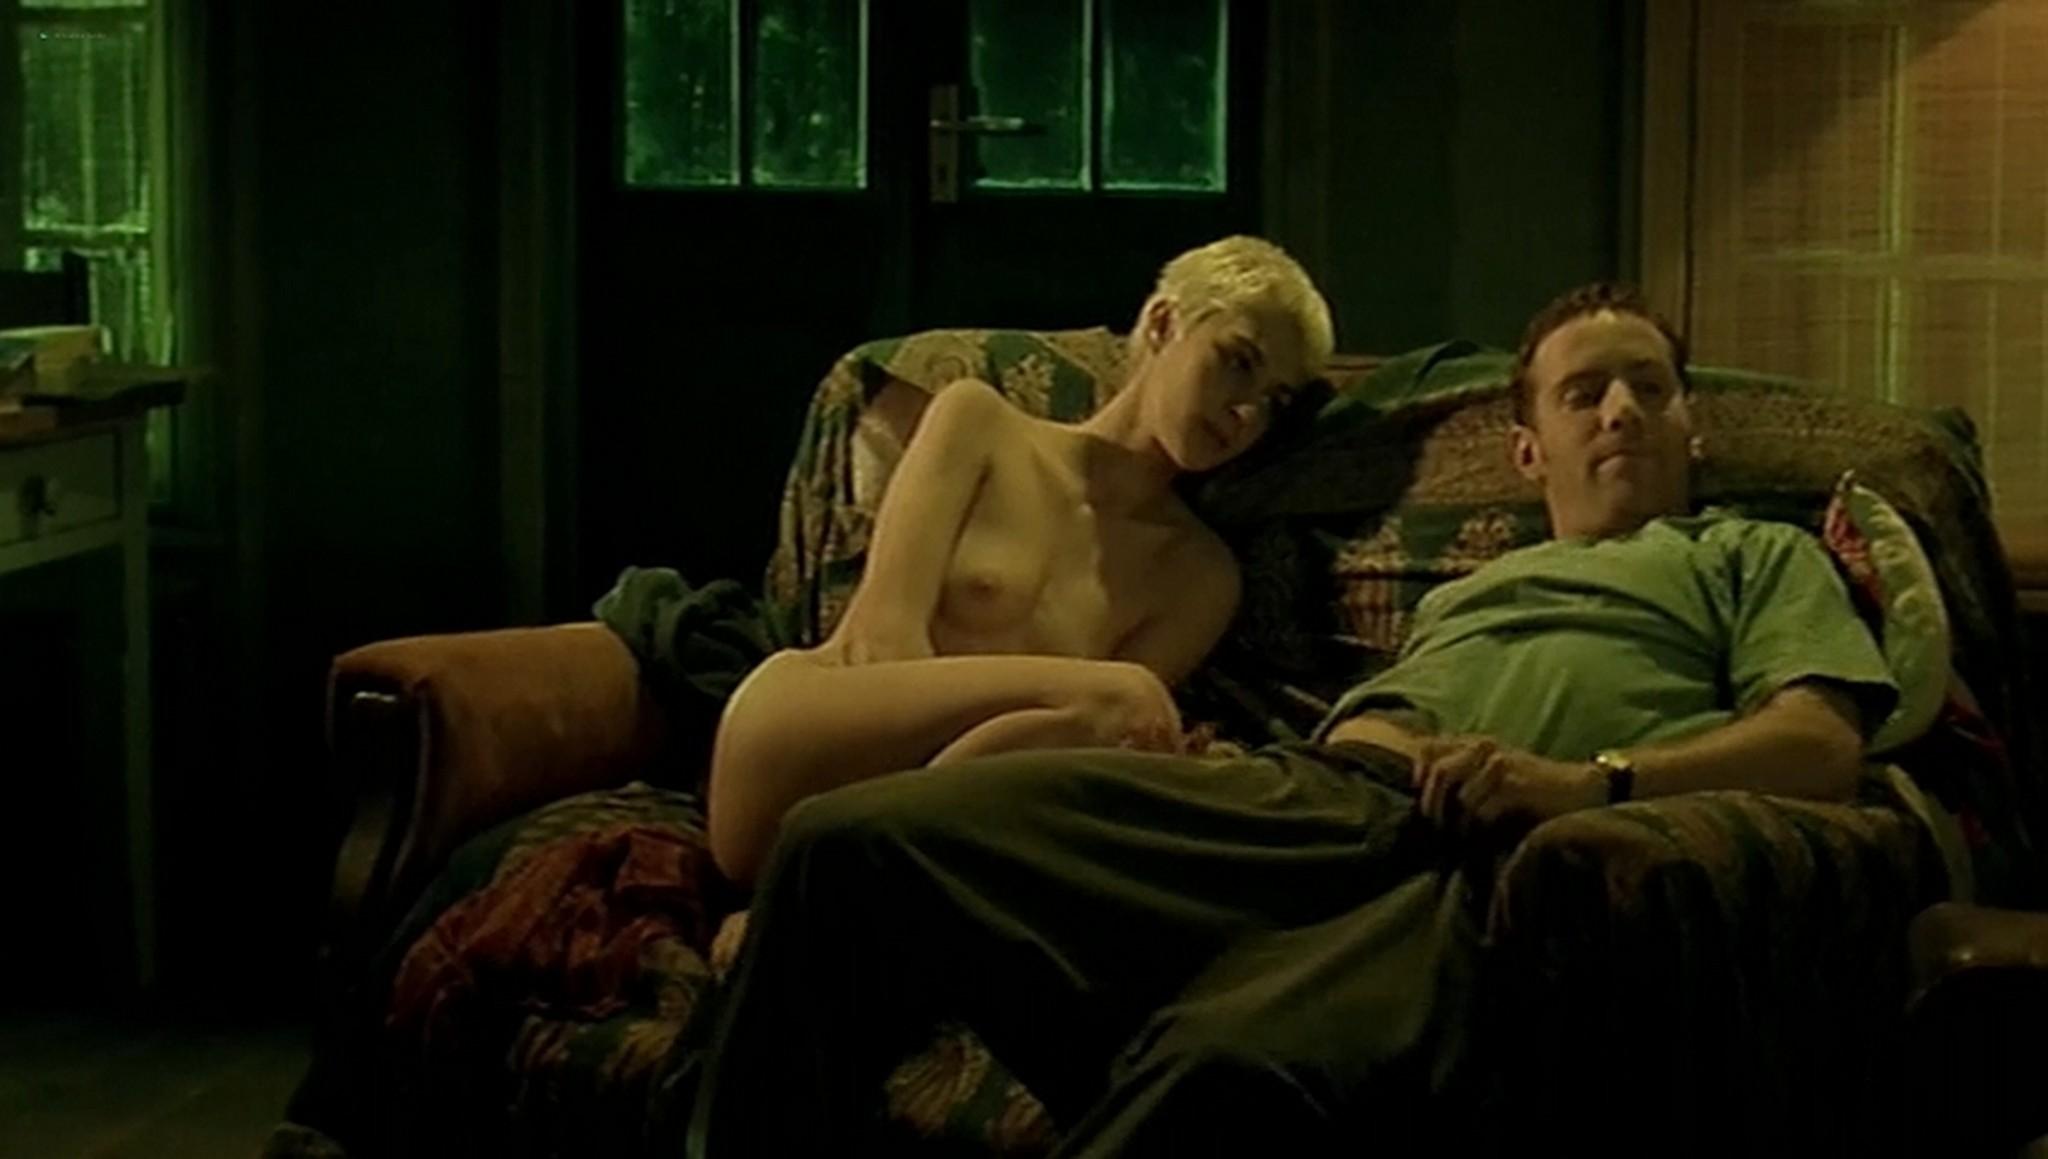 Rachel Weisz nude full frontal Labina Mitevska Dee Dee Menta all nude full frontal I Want You 1998 DVDRip 13